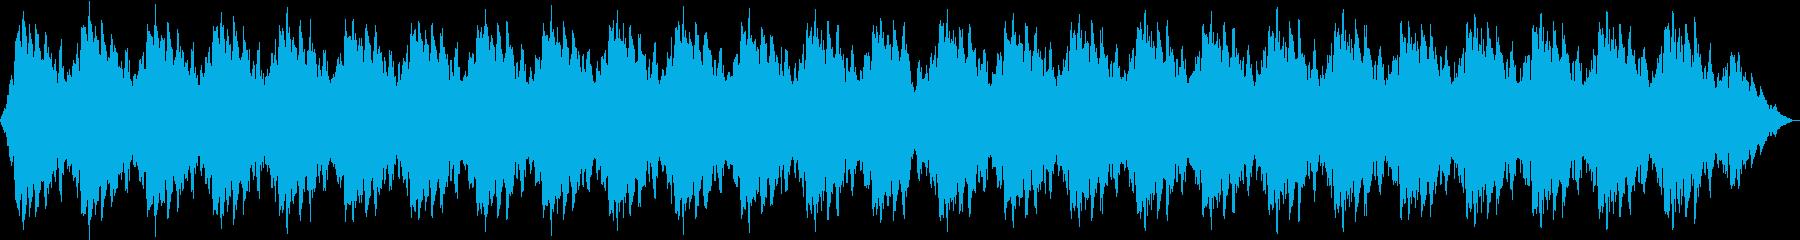 魔法詠唱、魔法発動、独白 11の再生済みの波形